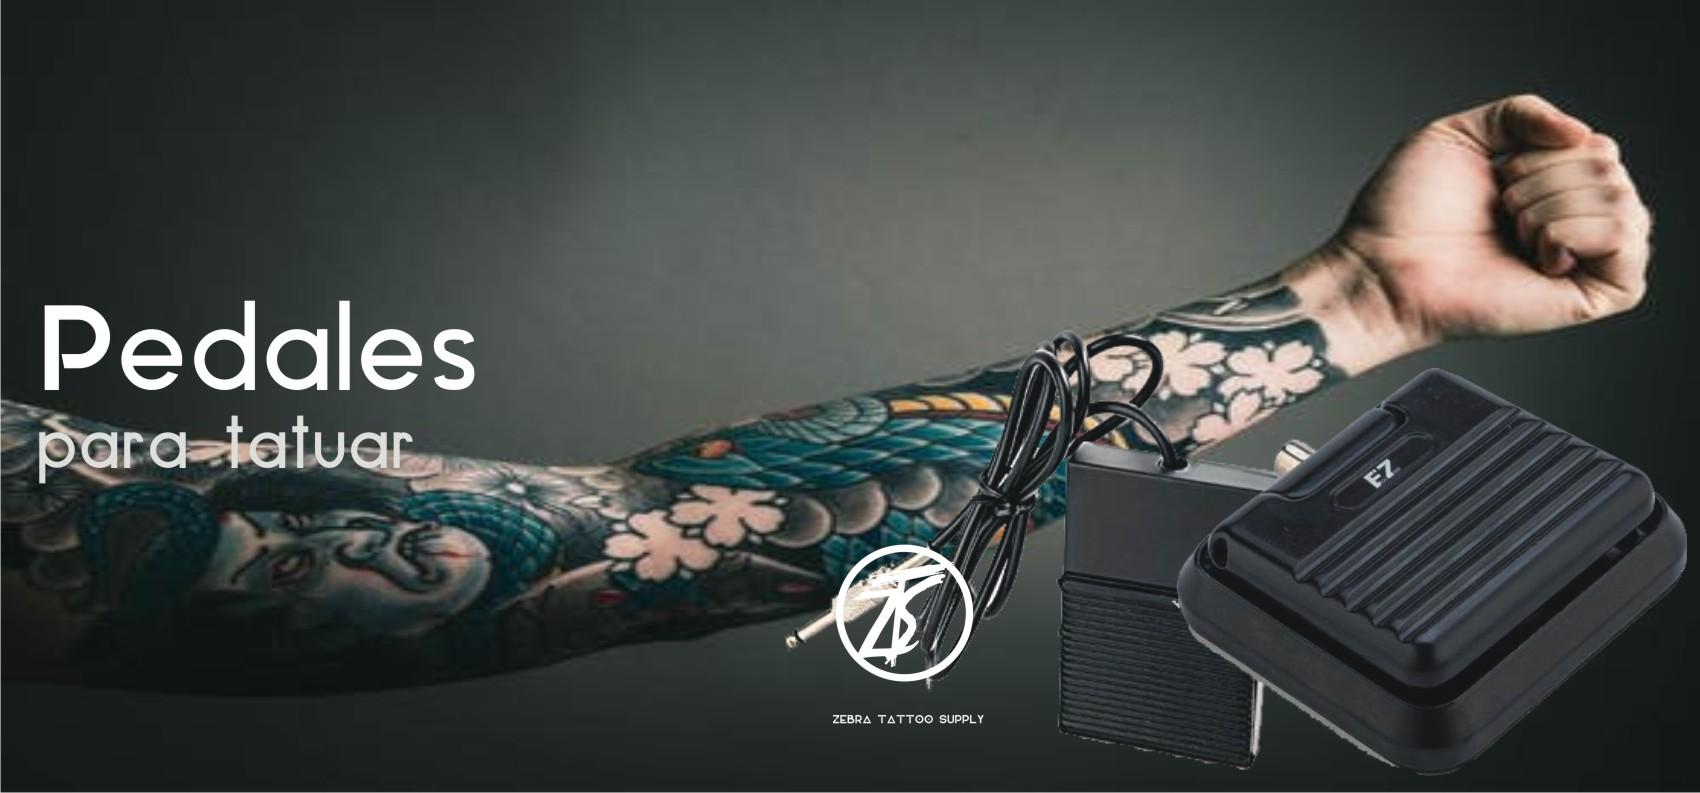 pedales para tatuar